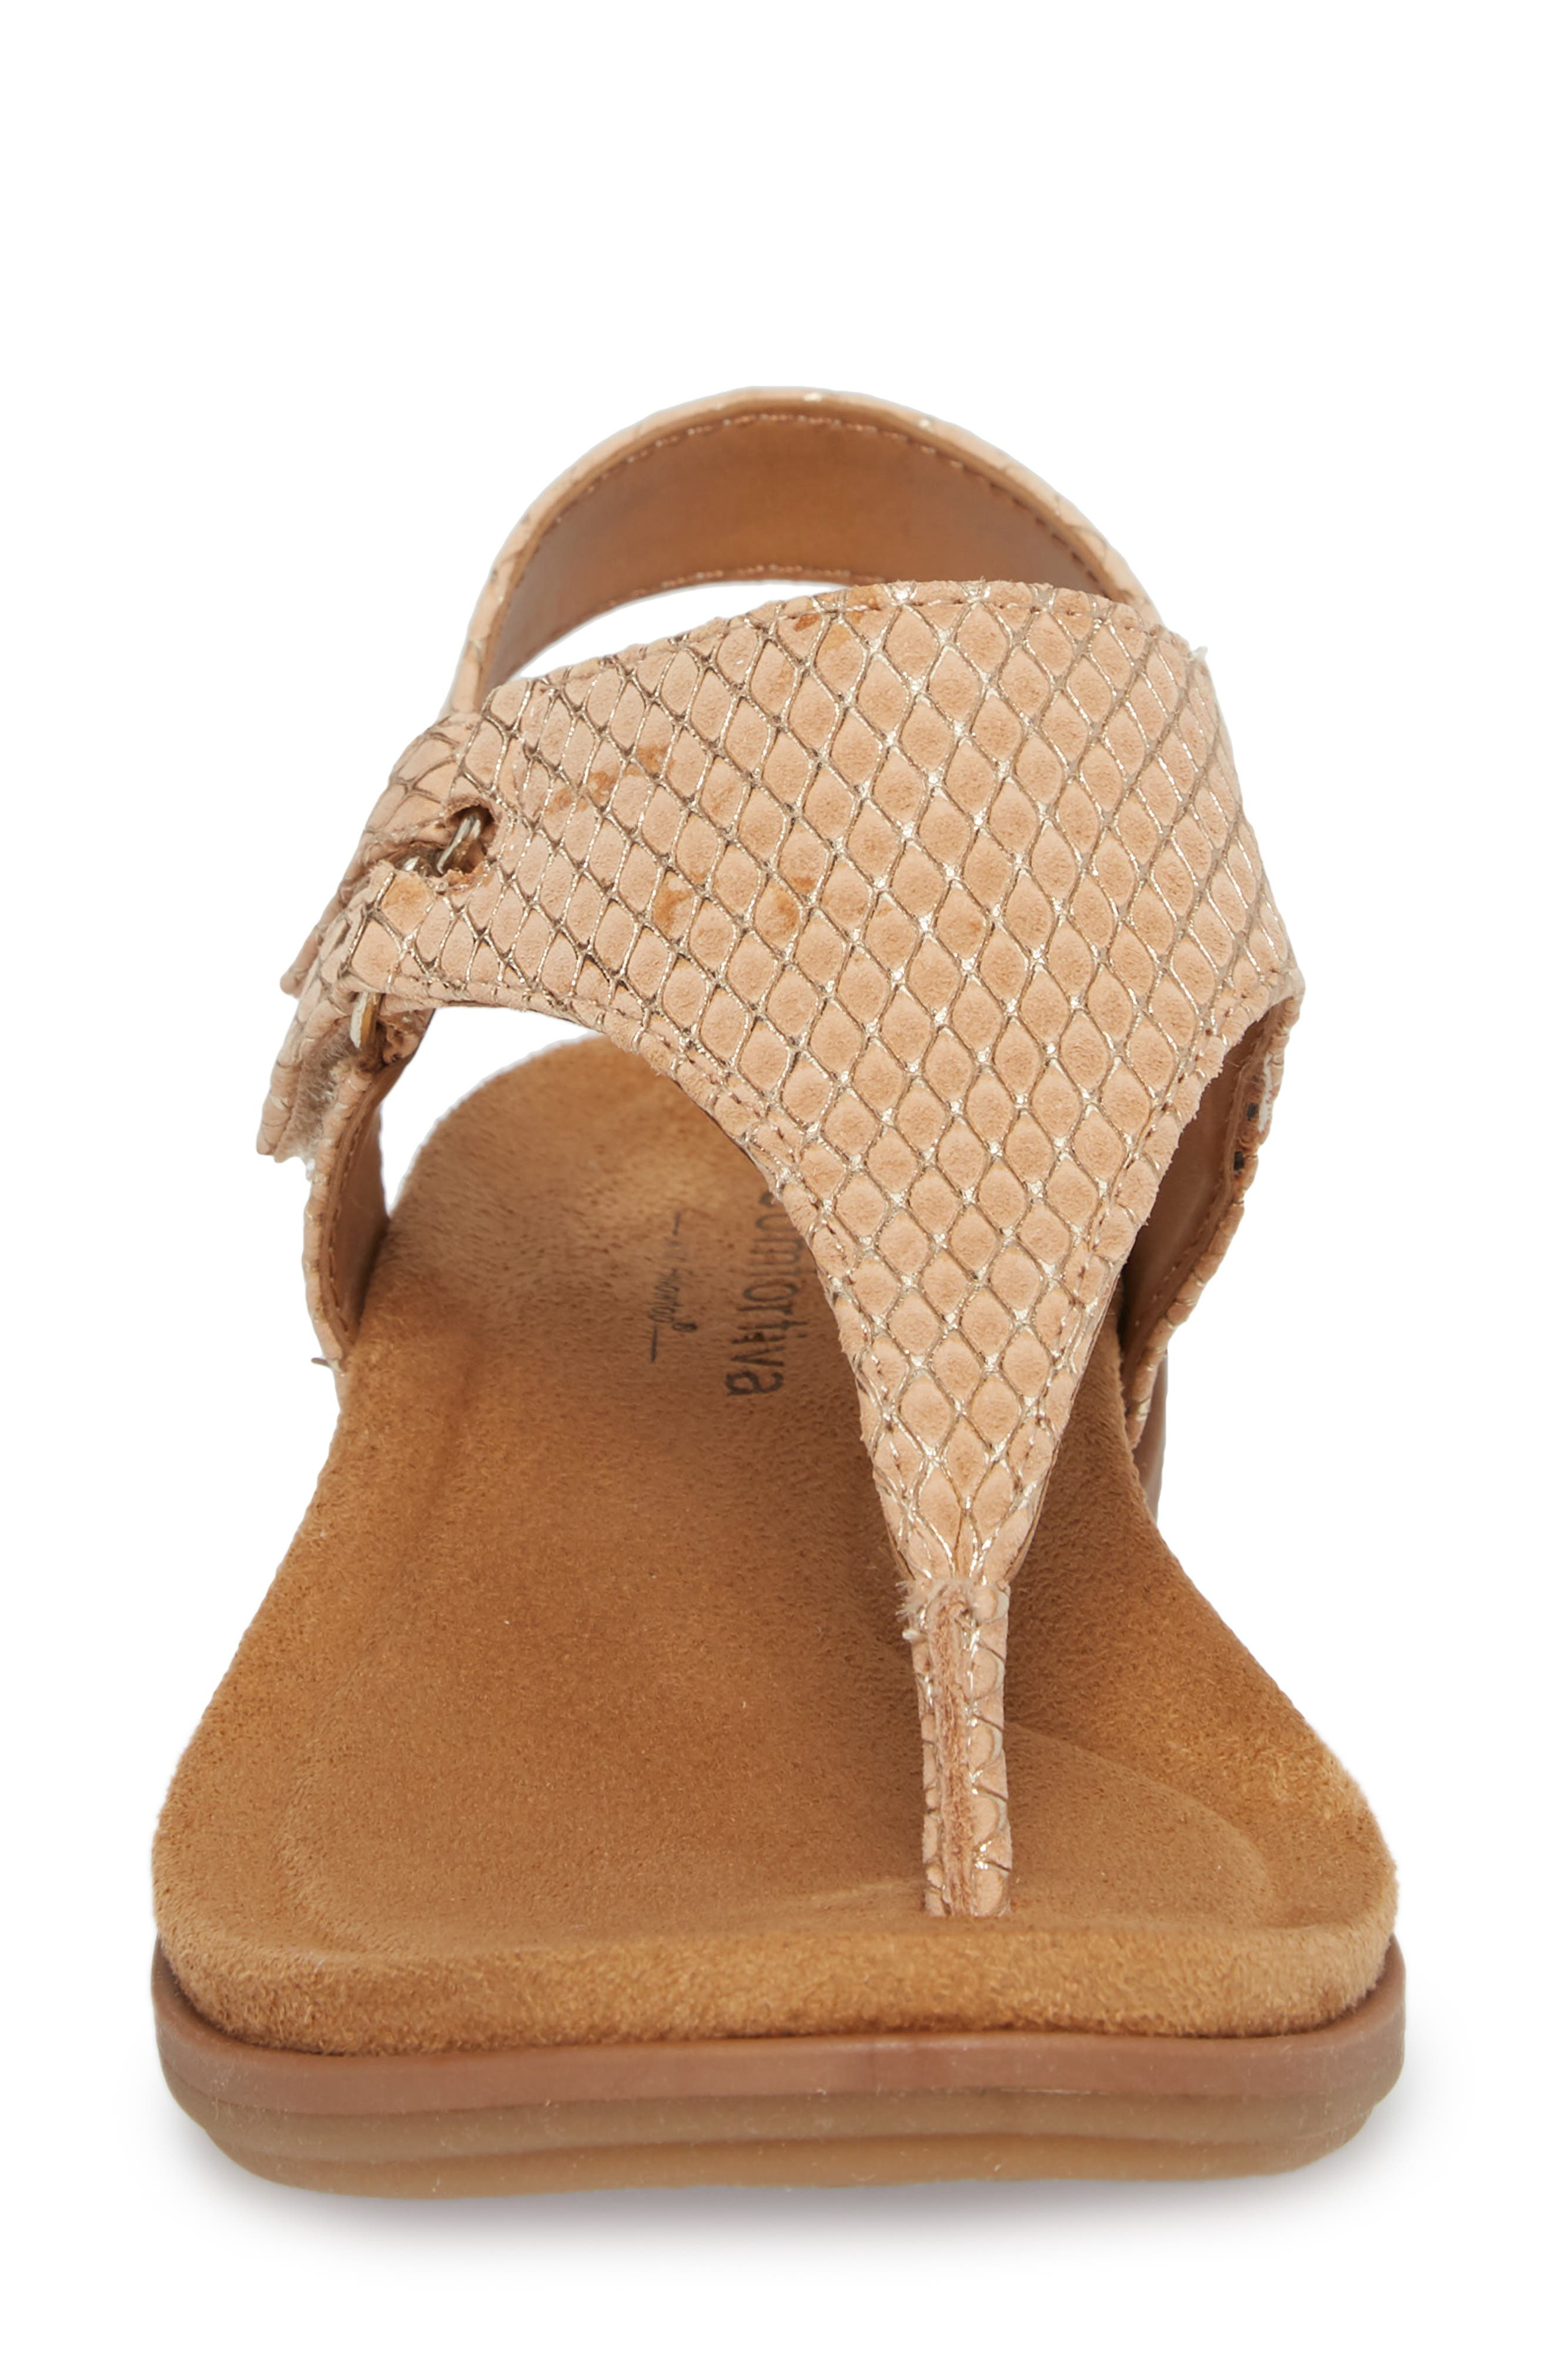 Calina Sandal,                             Alternate thumbnail 4, color,                             Sand Nubuck Leather